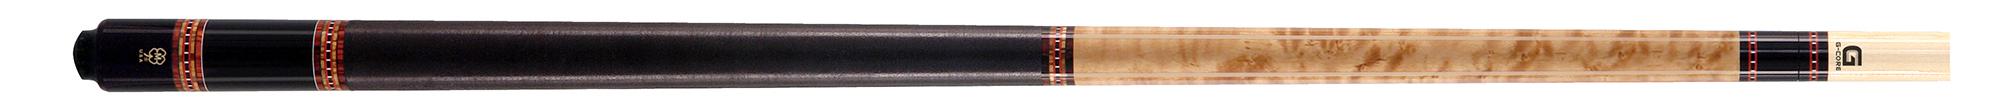 PK3016: McDermott G225 Birdseye Walnut pool Gewicht: 19Oz #1